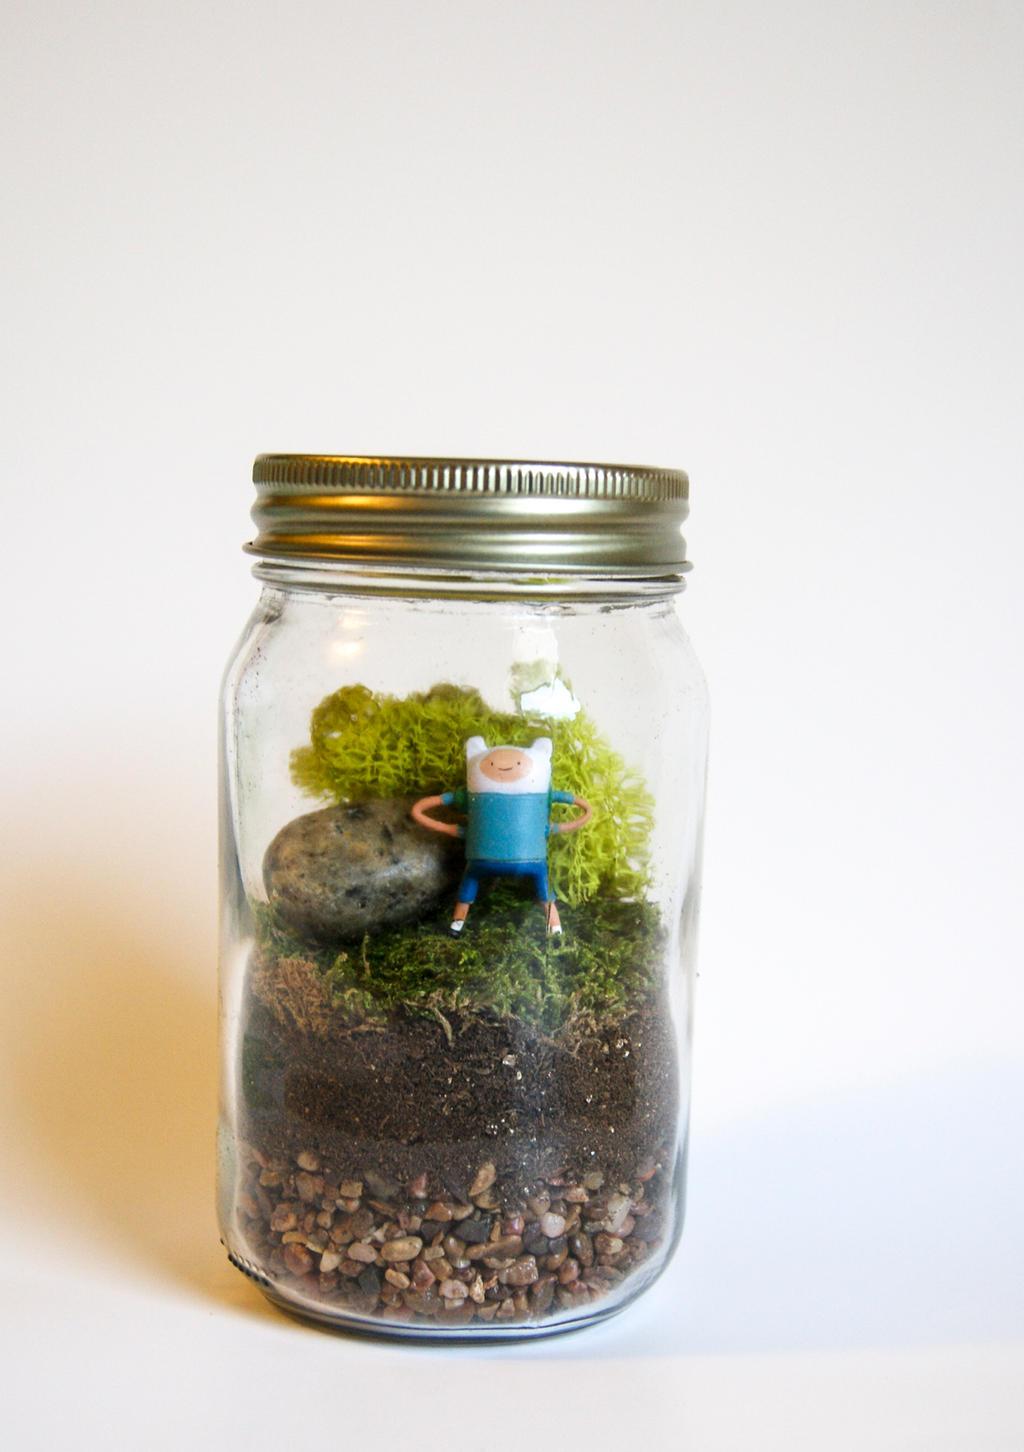 Finn Mason Jar Terrarium Adventure Time By Maforet On Deviantart